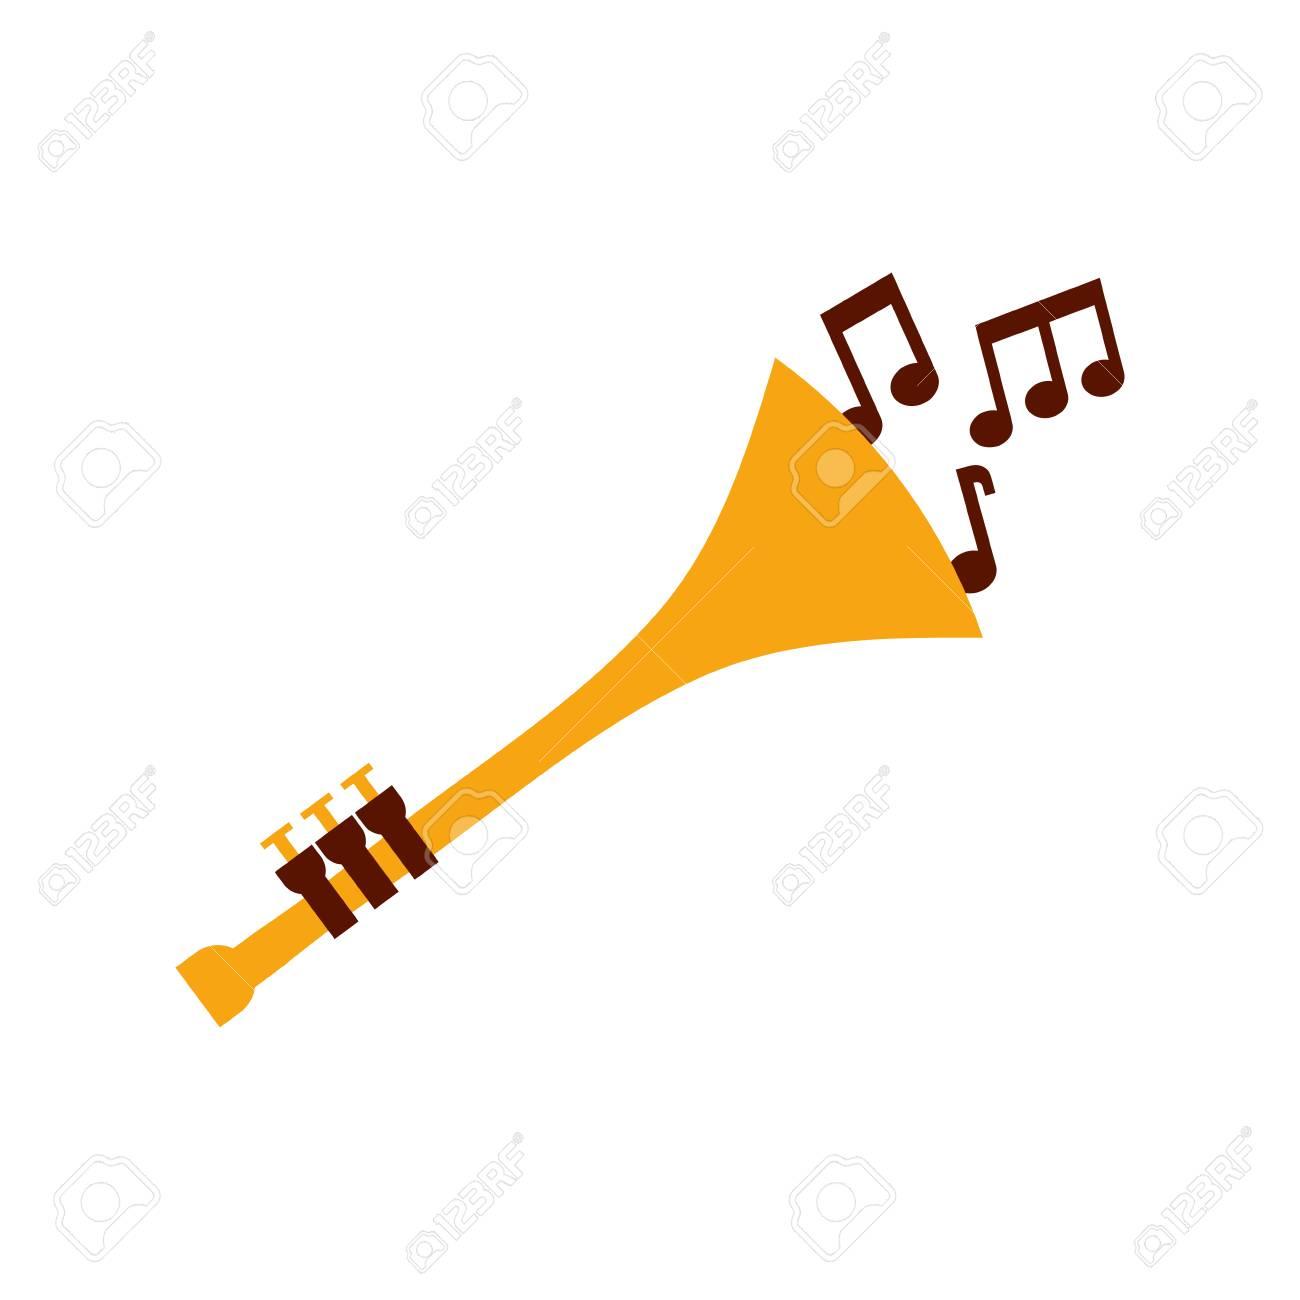 hight resolution of trumpet notes wind musical instrument horn vector illustration stock vector 90294513